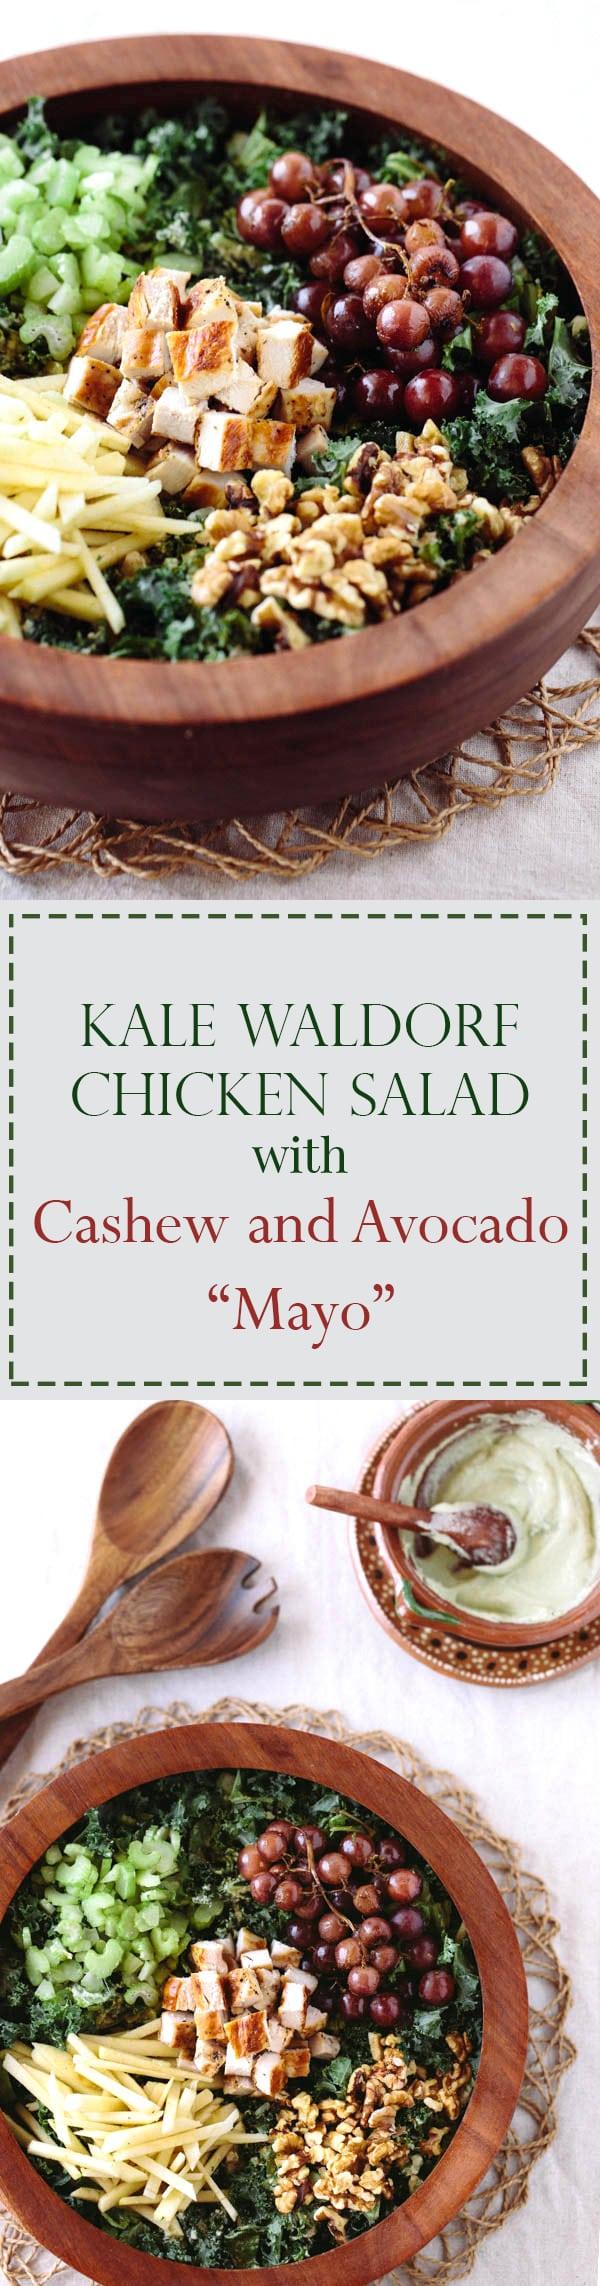 "Kale Waldorf Chicken Salad with Cashew & Avocado ""Mayo"""